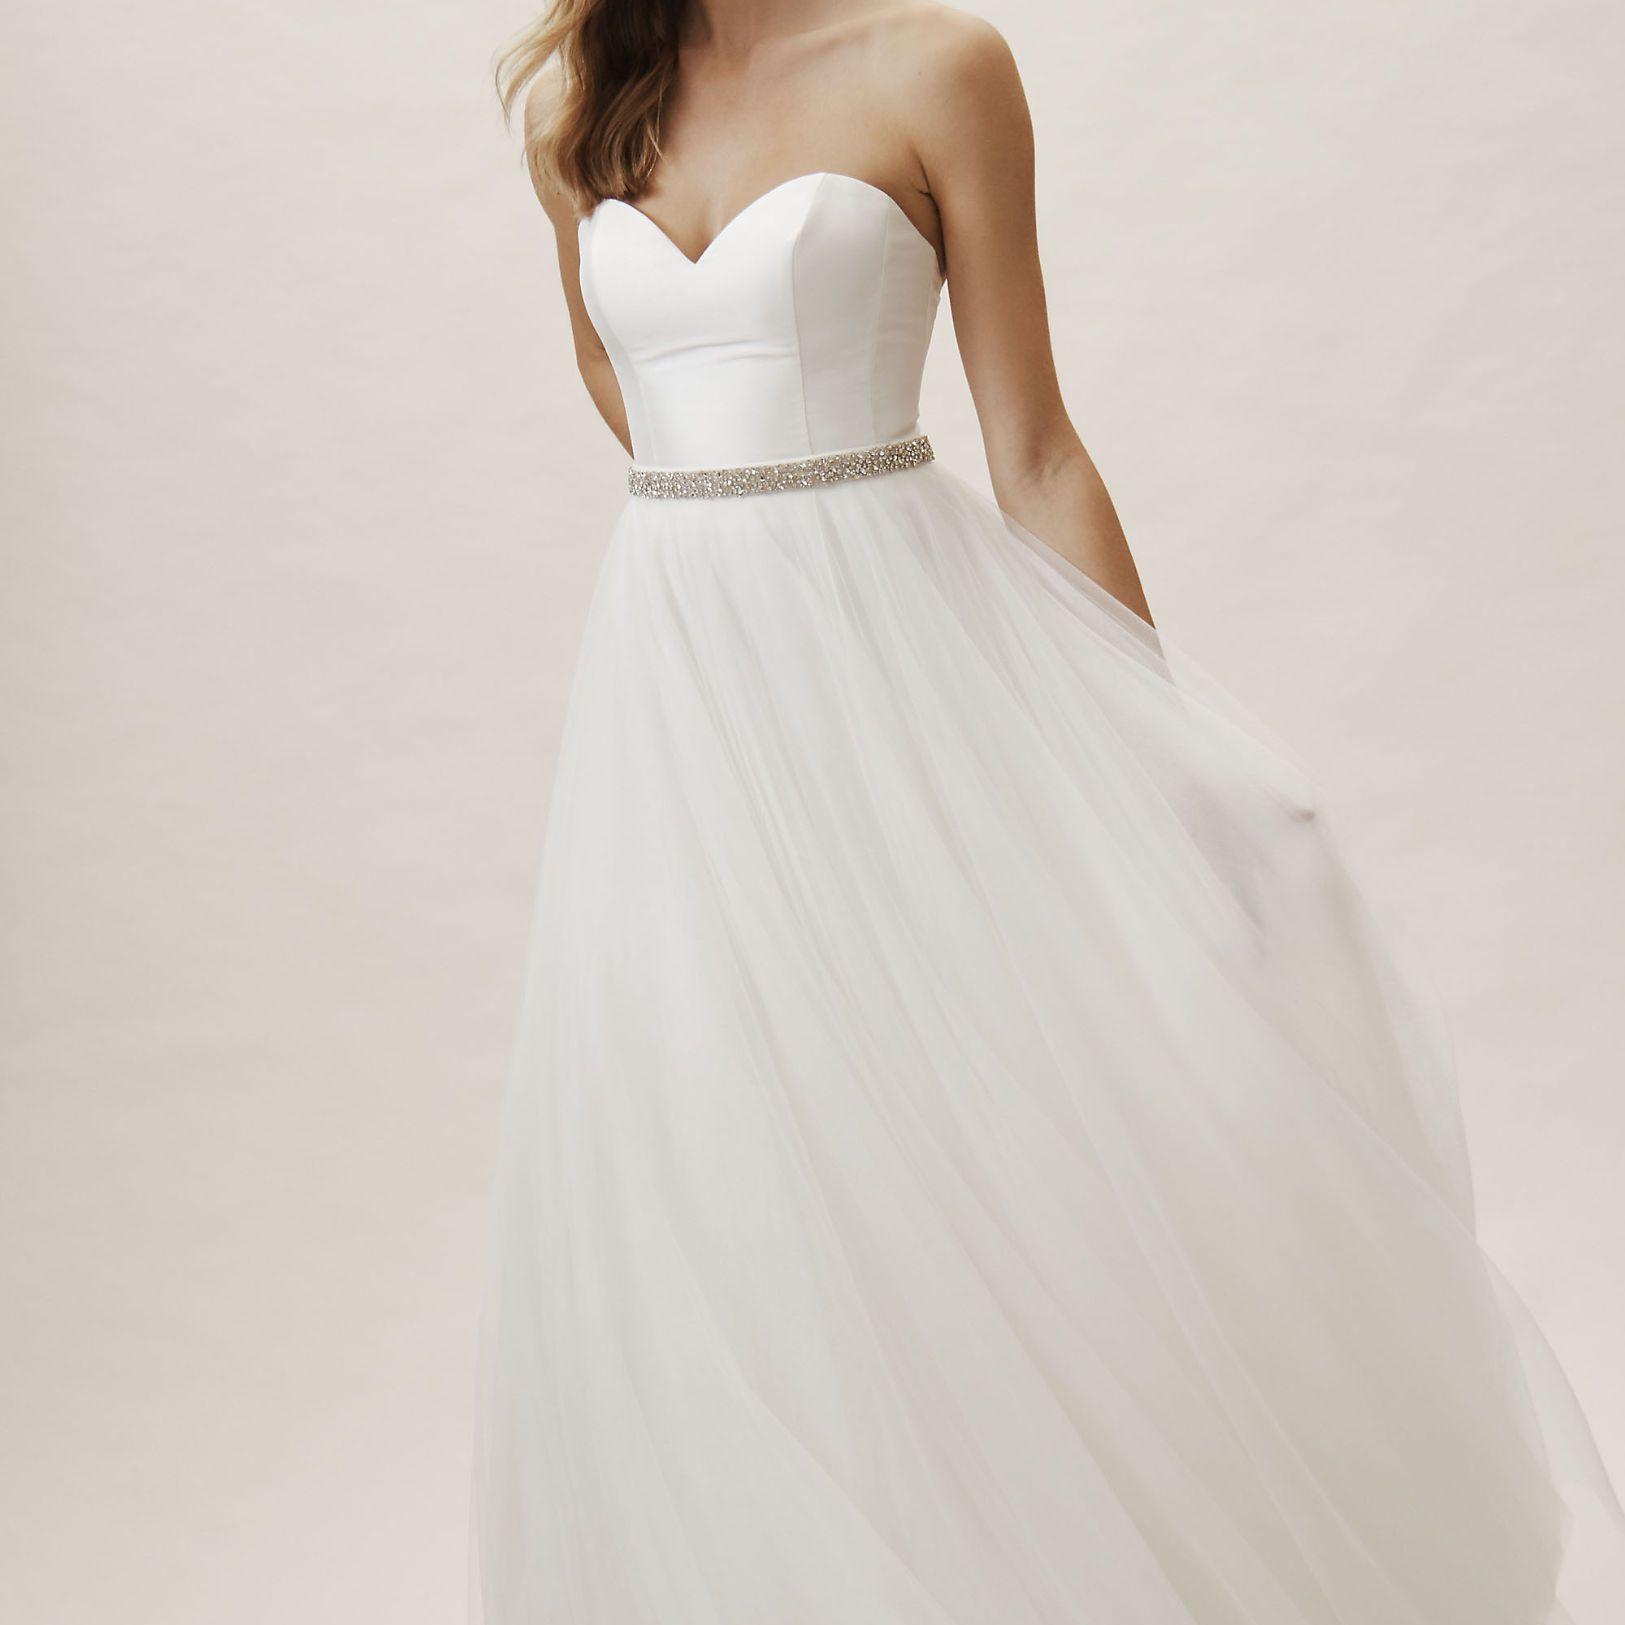 15 Bridal Separates Sets For A Modern Bridal Moment,Short White Dress Wedding